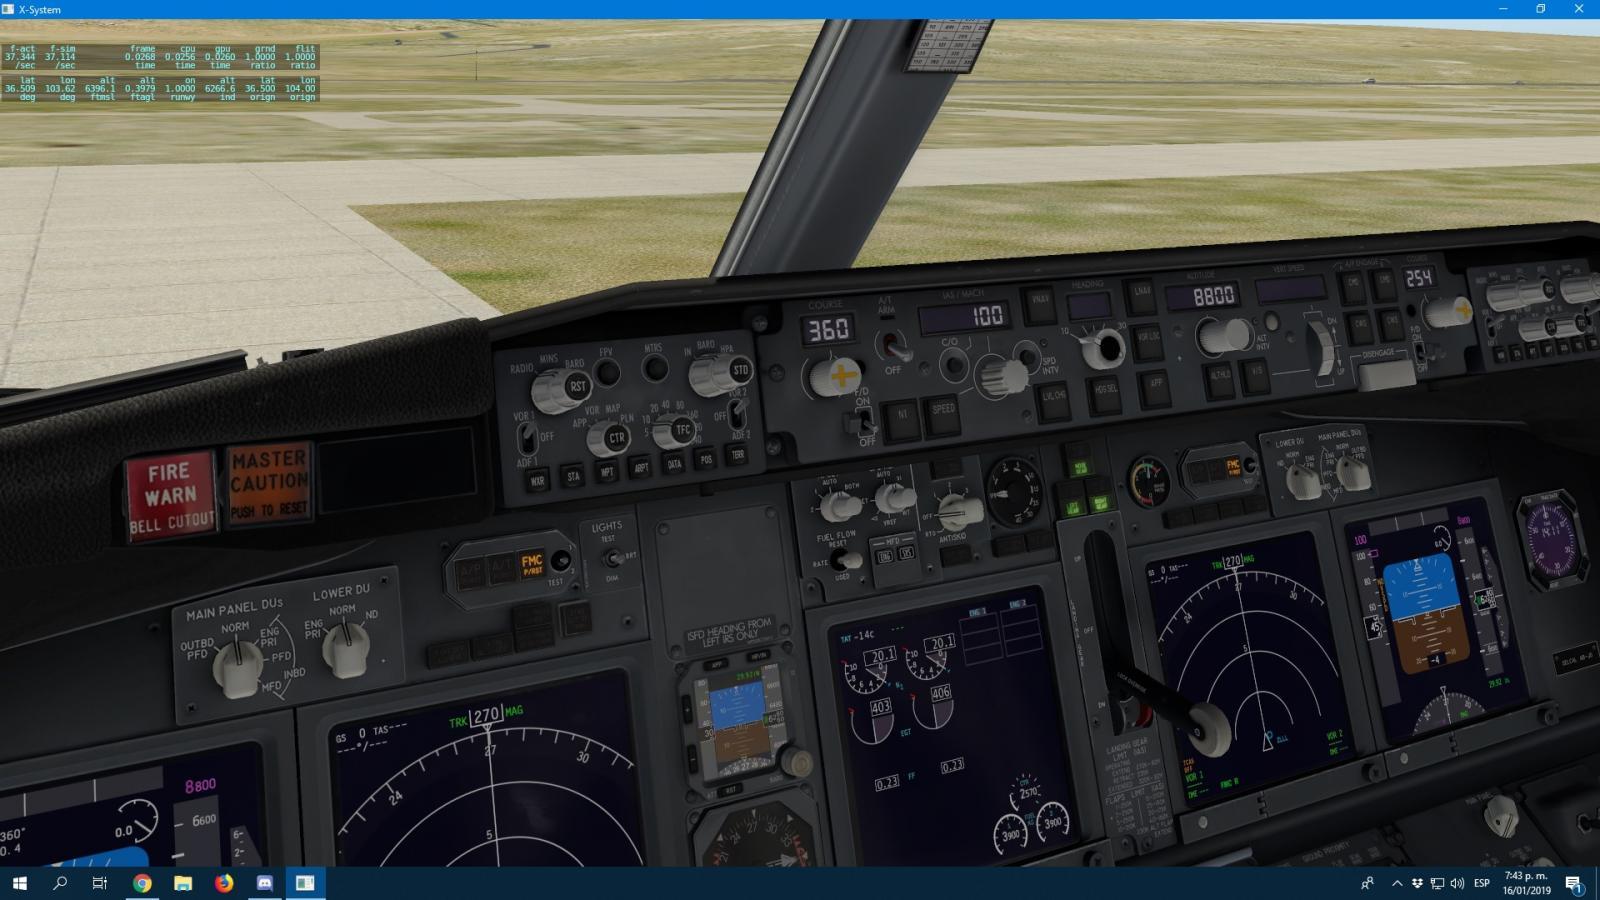 Autopilot HDG knob missing - ZIBO B738-800 modified - X-Plane Org Forum